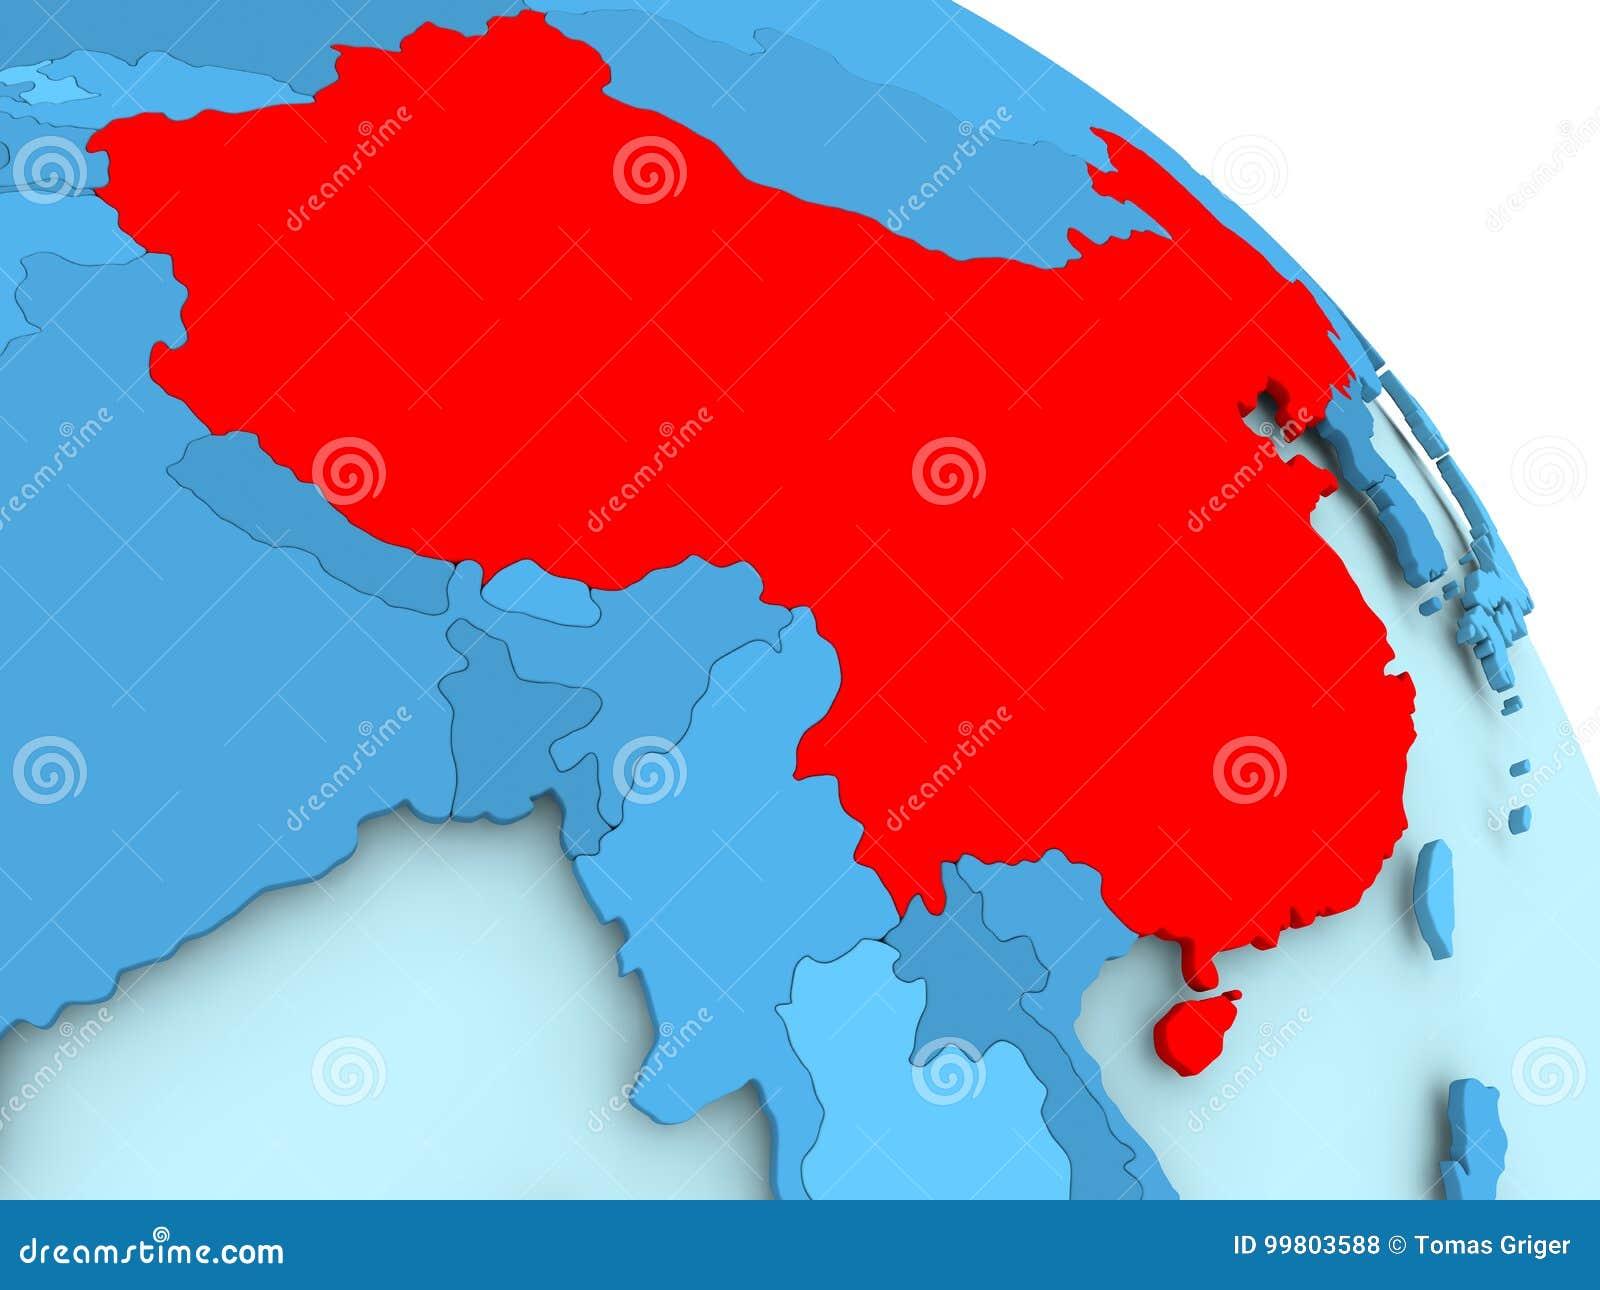 China on blue globe stock illustration illustration of world 99803588 china highlighted on blue 3d model of political globe 3d illustration gumiabroncs Choice Image